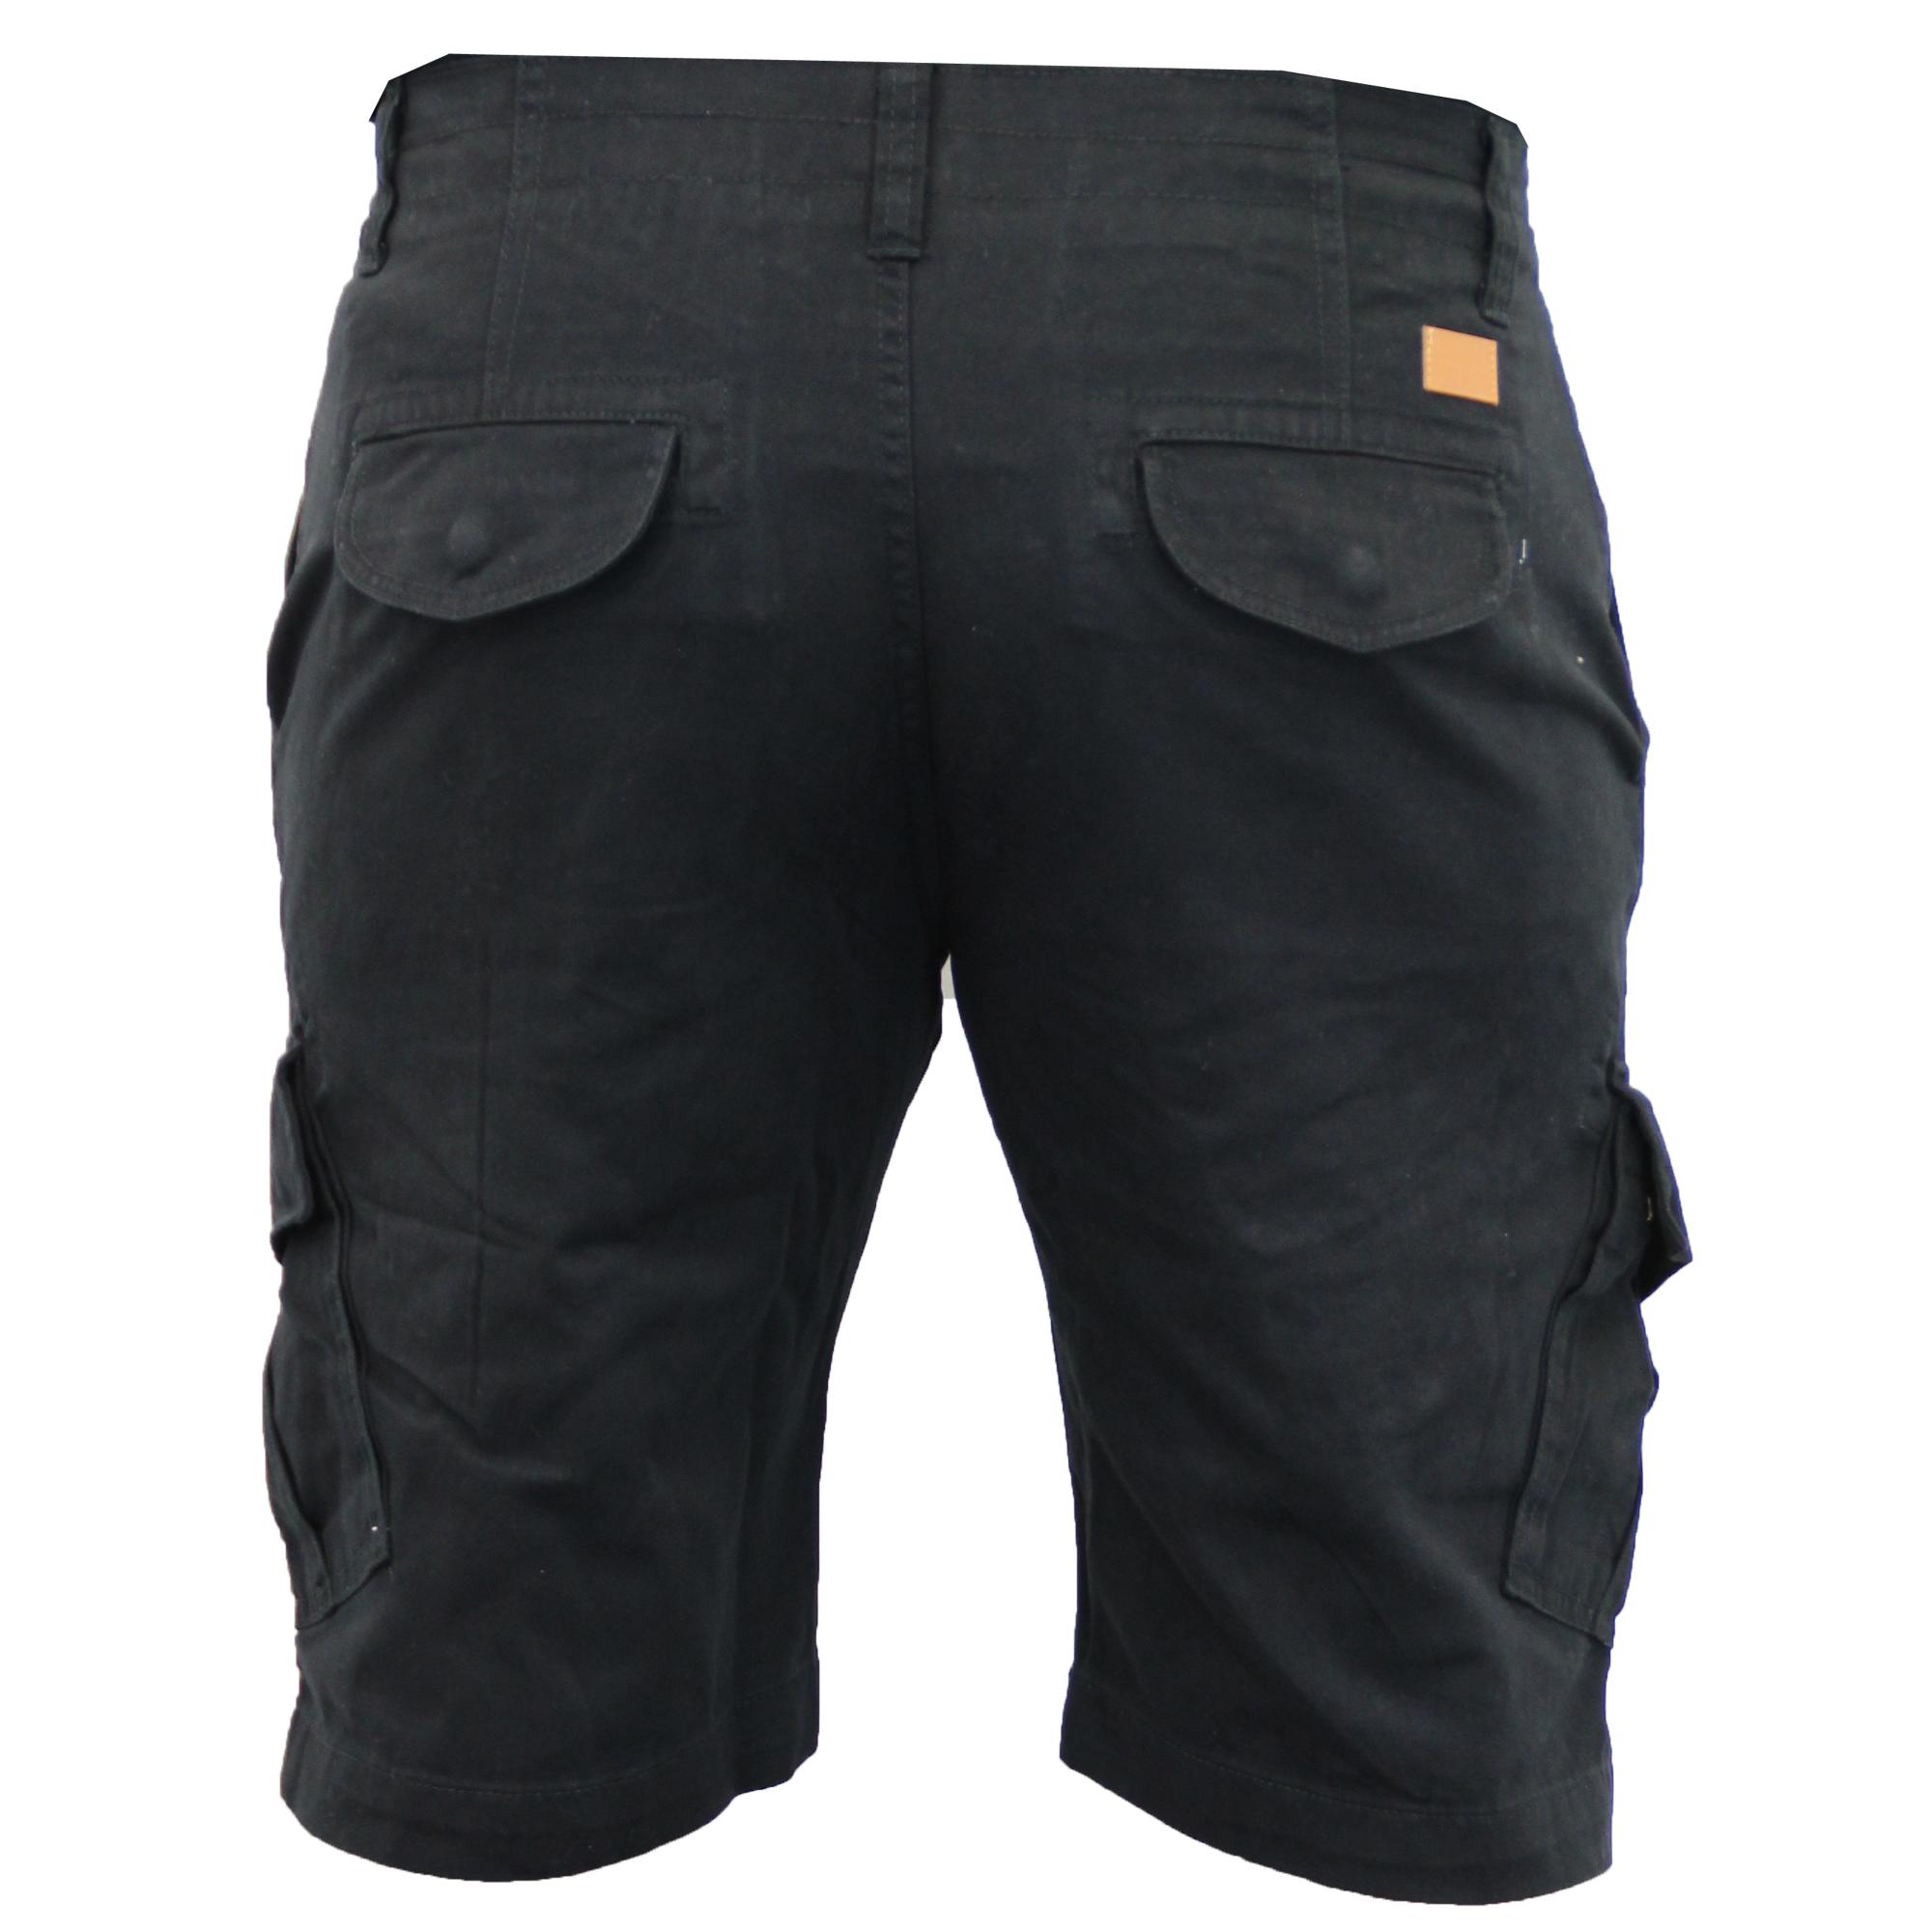 Mens-Cargo-Chino-Shorts-Threadbare-Combat-Knee-Length-Westace-Military-Summer thumbnail 5